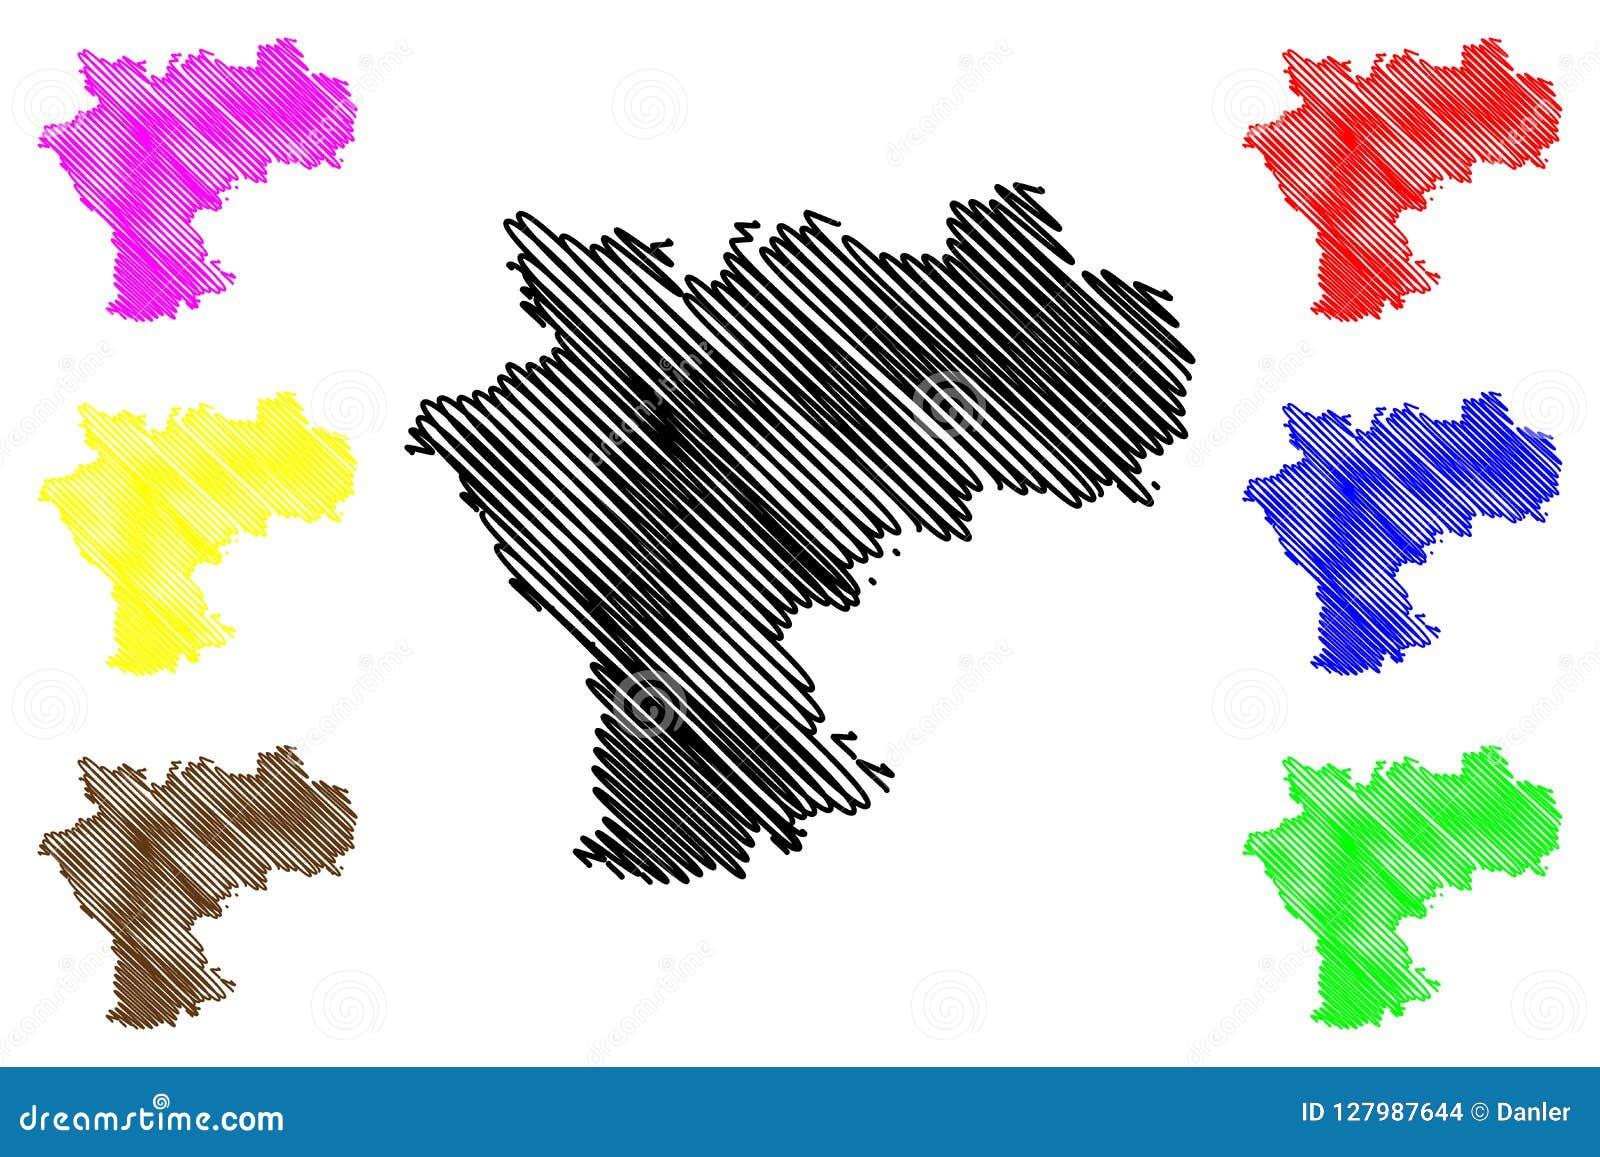 Ulyanovsk Oblast Map Vector Stock Vector - Illustration of outline ...